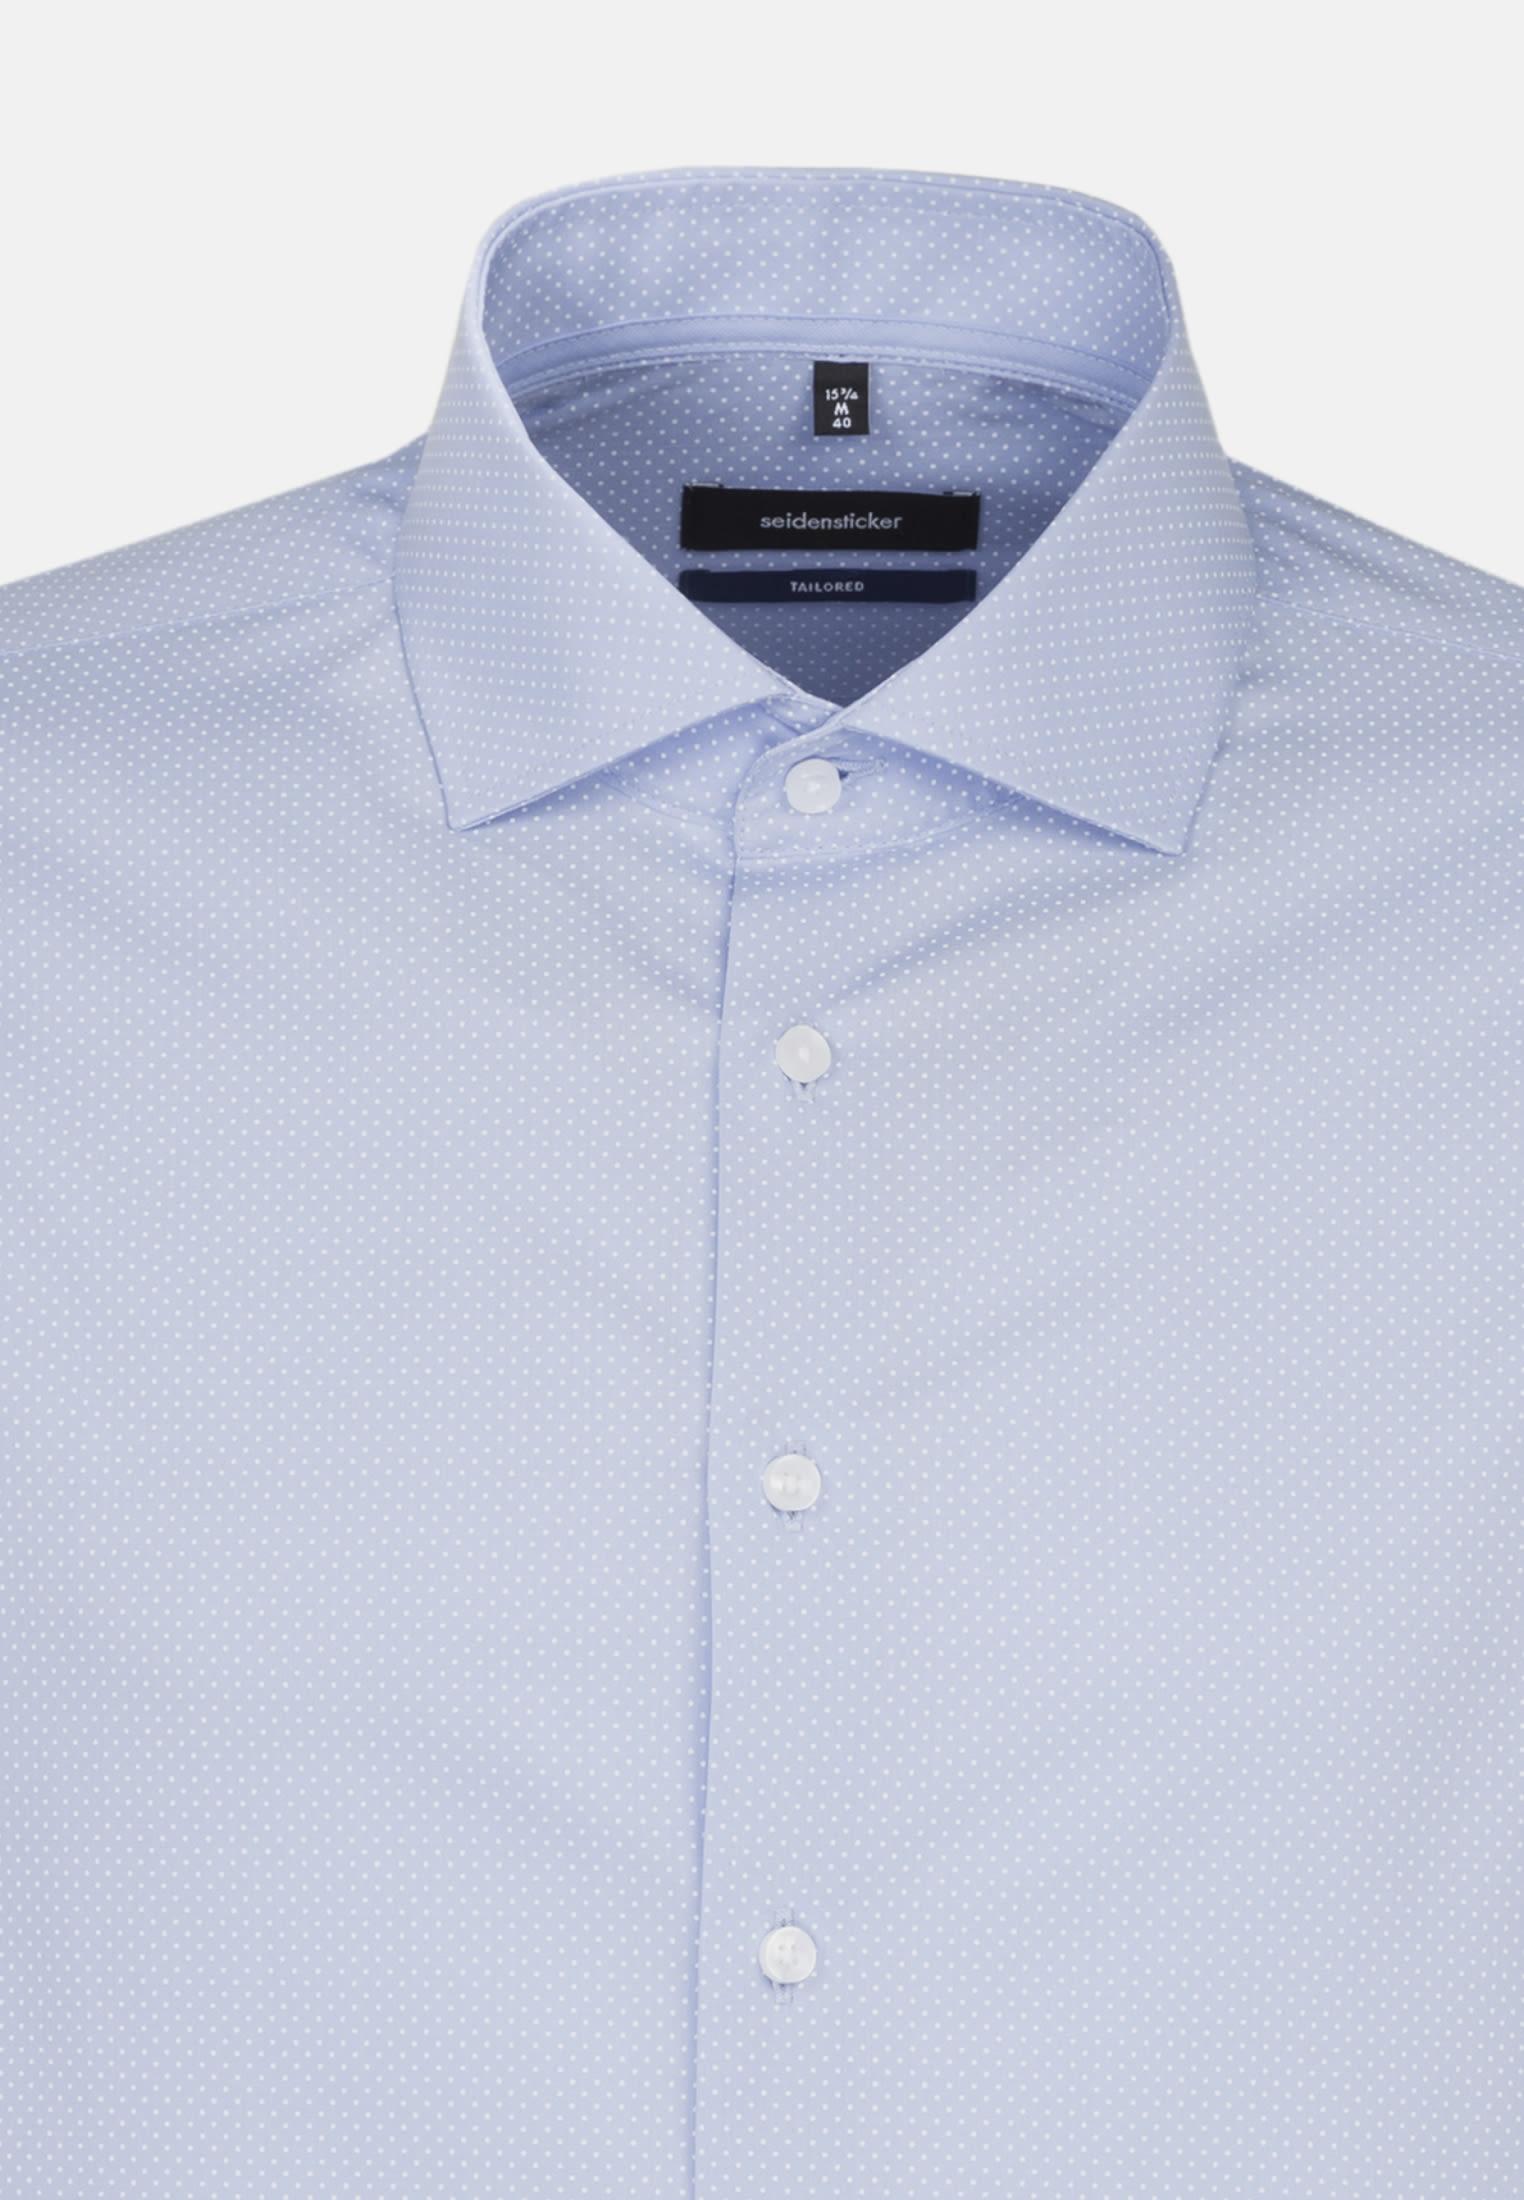 Easy-iron Poplin Business Shirt in Tailored with Kent-Collar in blau |  Seidensticker Onlineshop